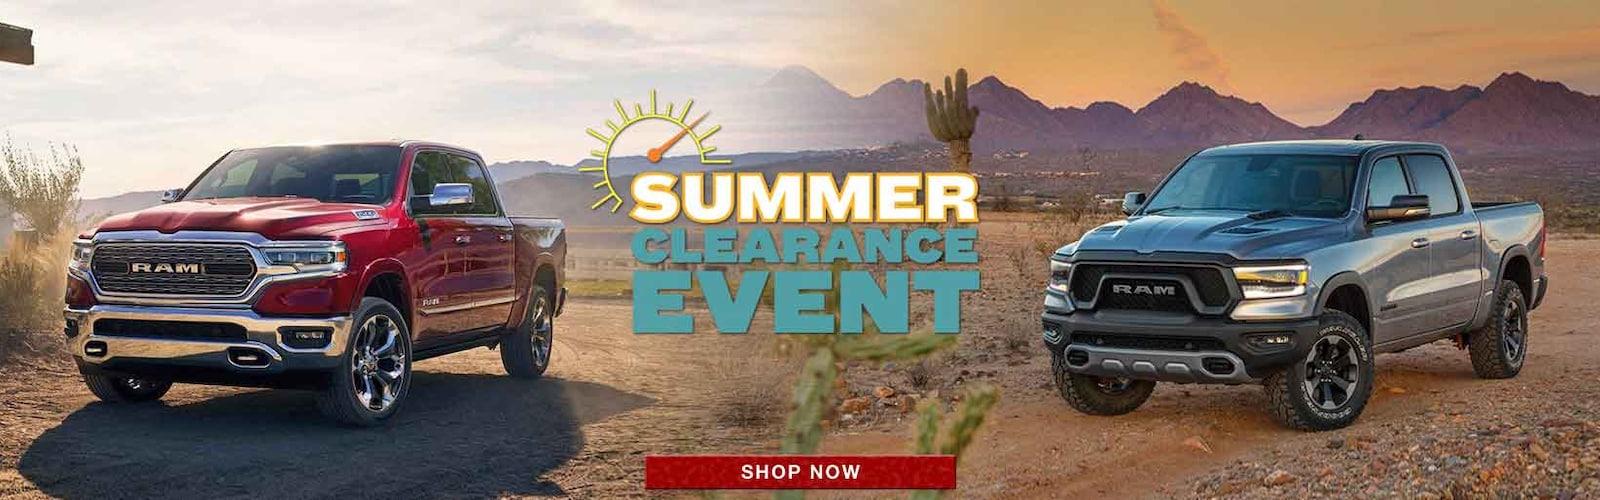 Car Dealerships In Lancaster Ohio >> Bob Boyd Chrysler Jeep Dodge Lancaster Oh New Used Cars Trucks